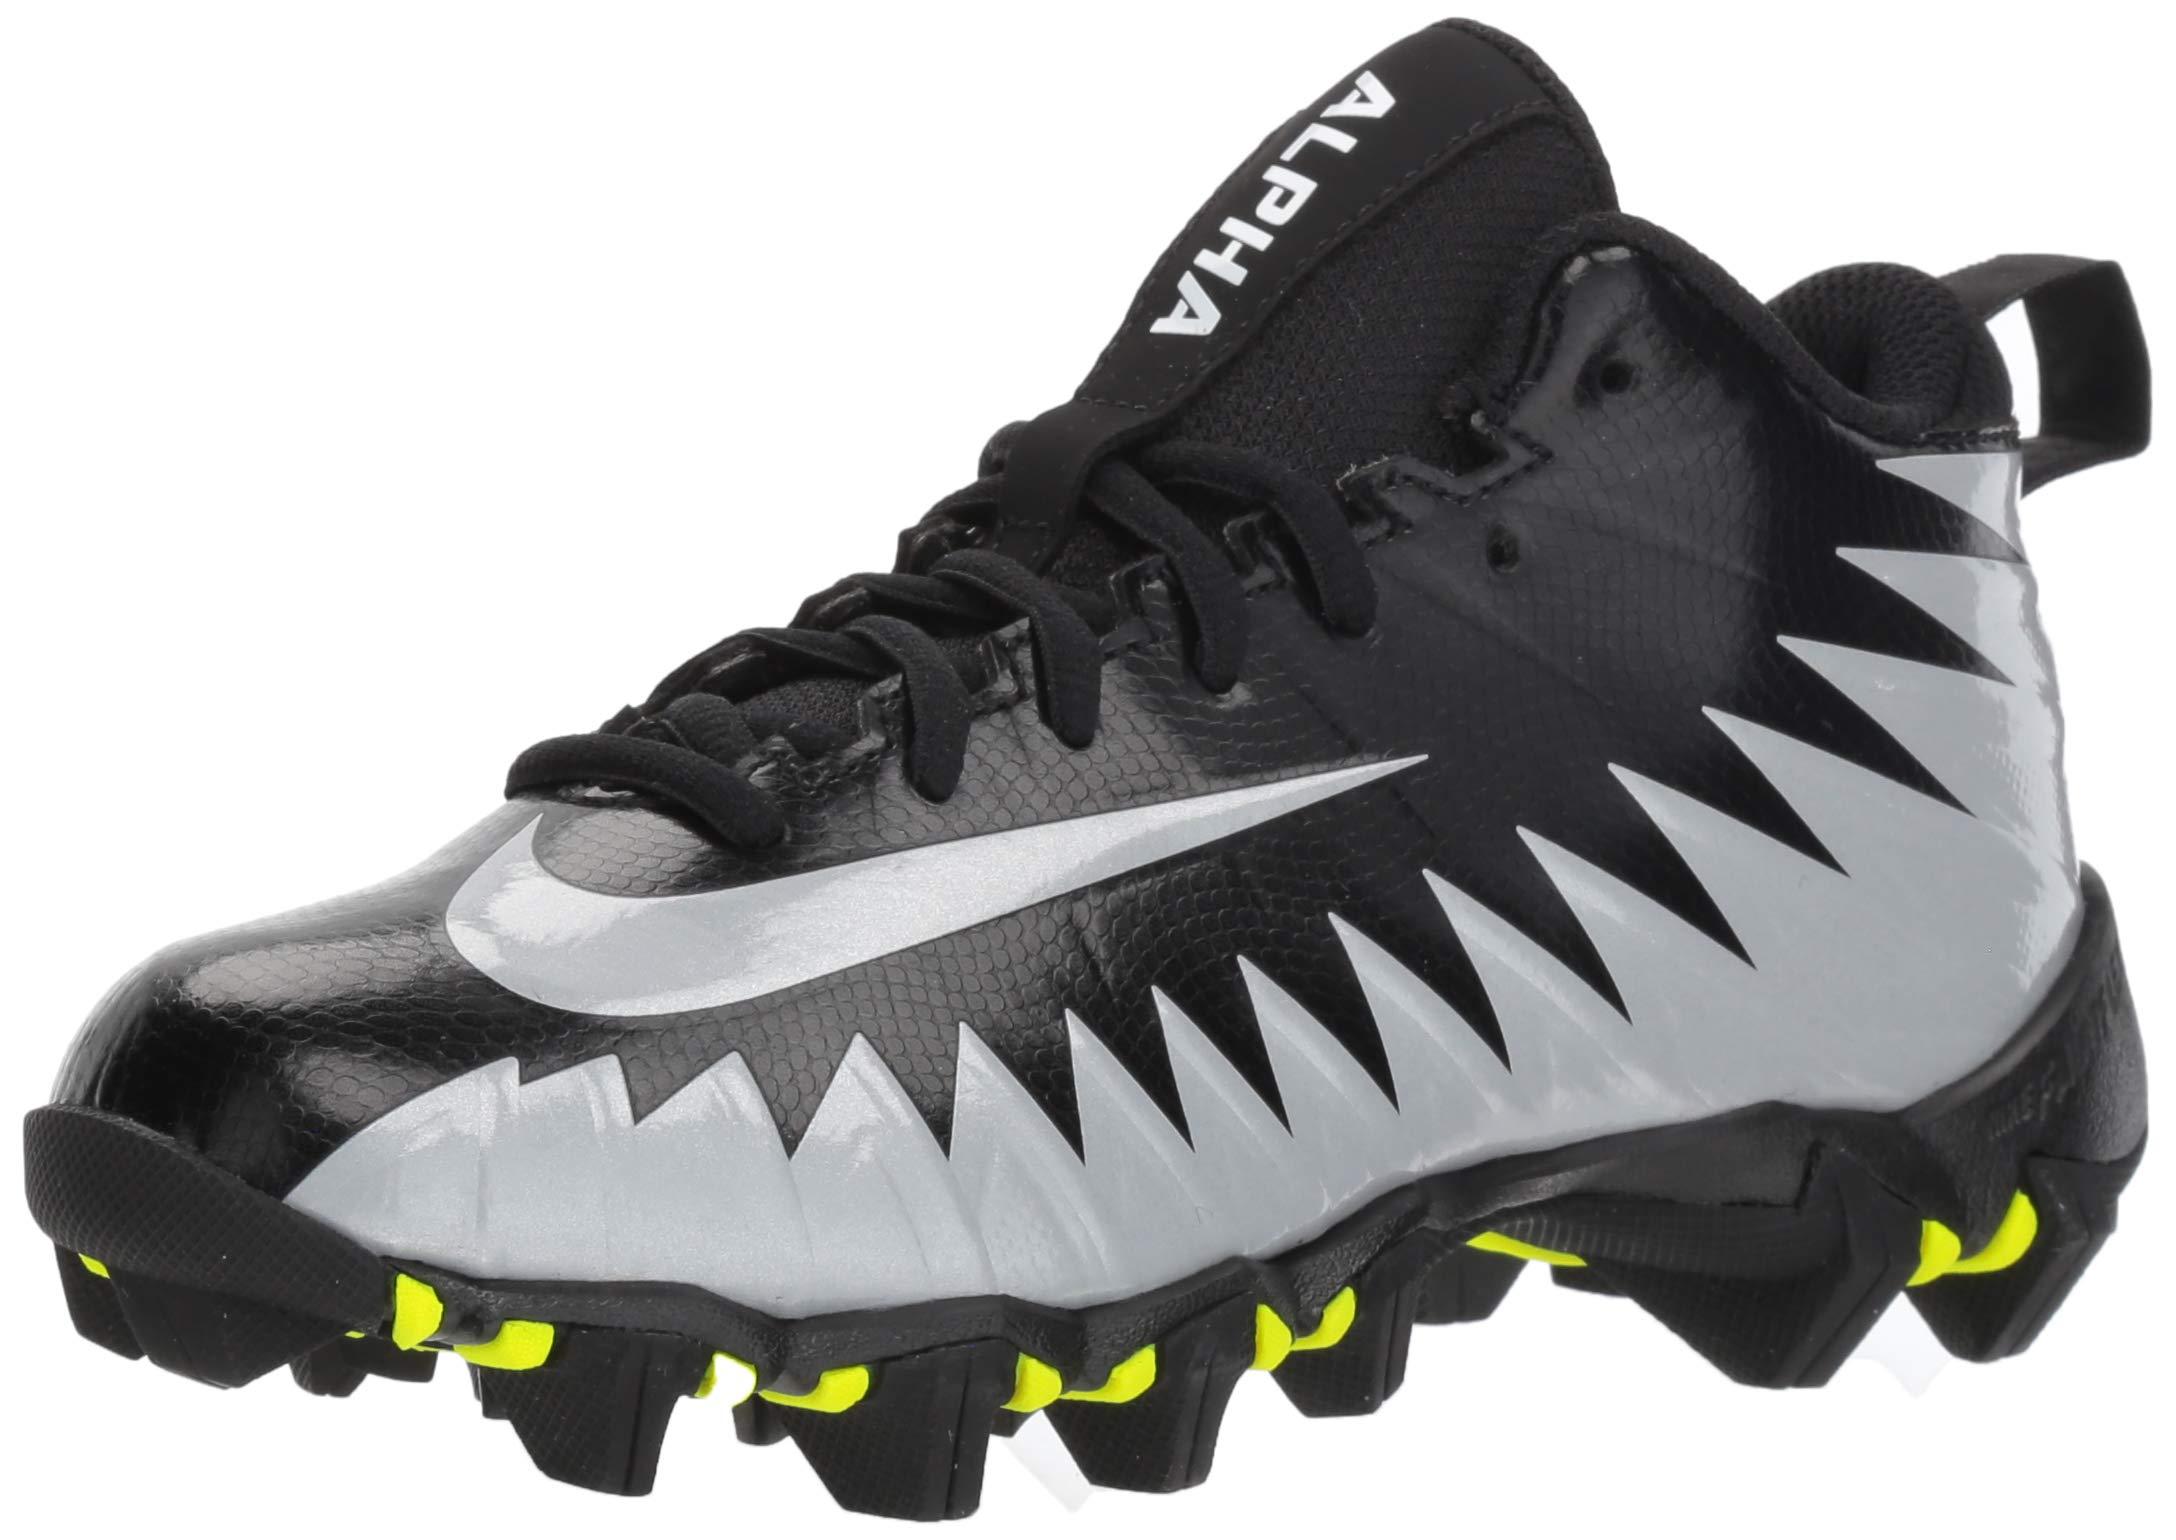 Nike Men's Alpha Menace Shark Football Cleat Black/Metallic Silver/White Size 9 M US by Nike